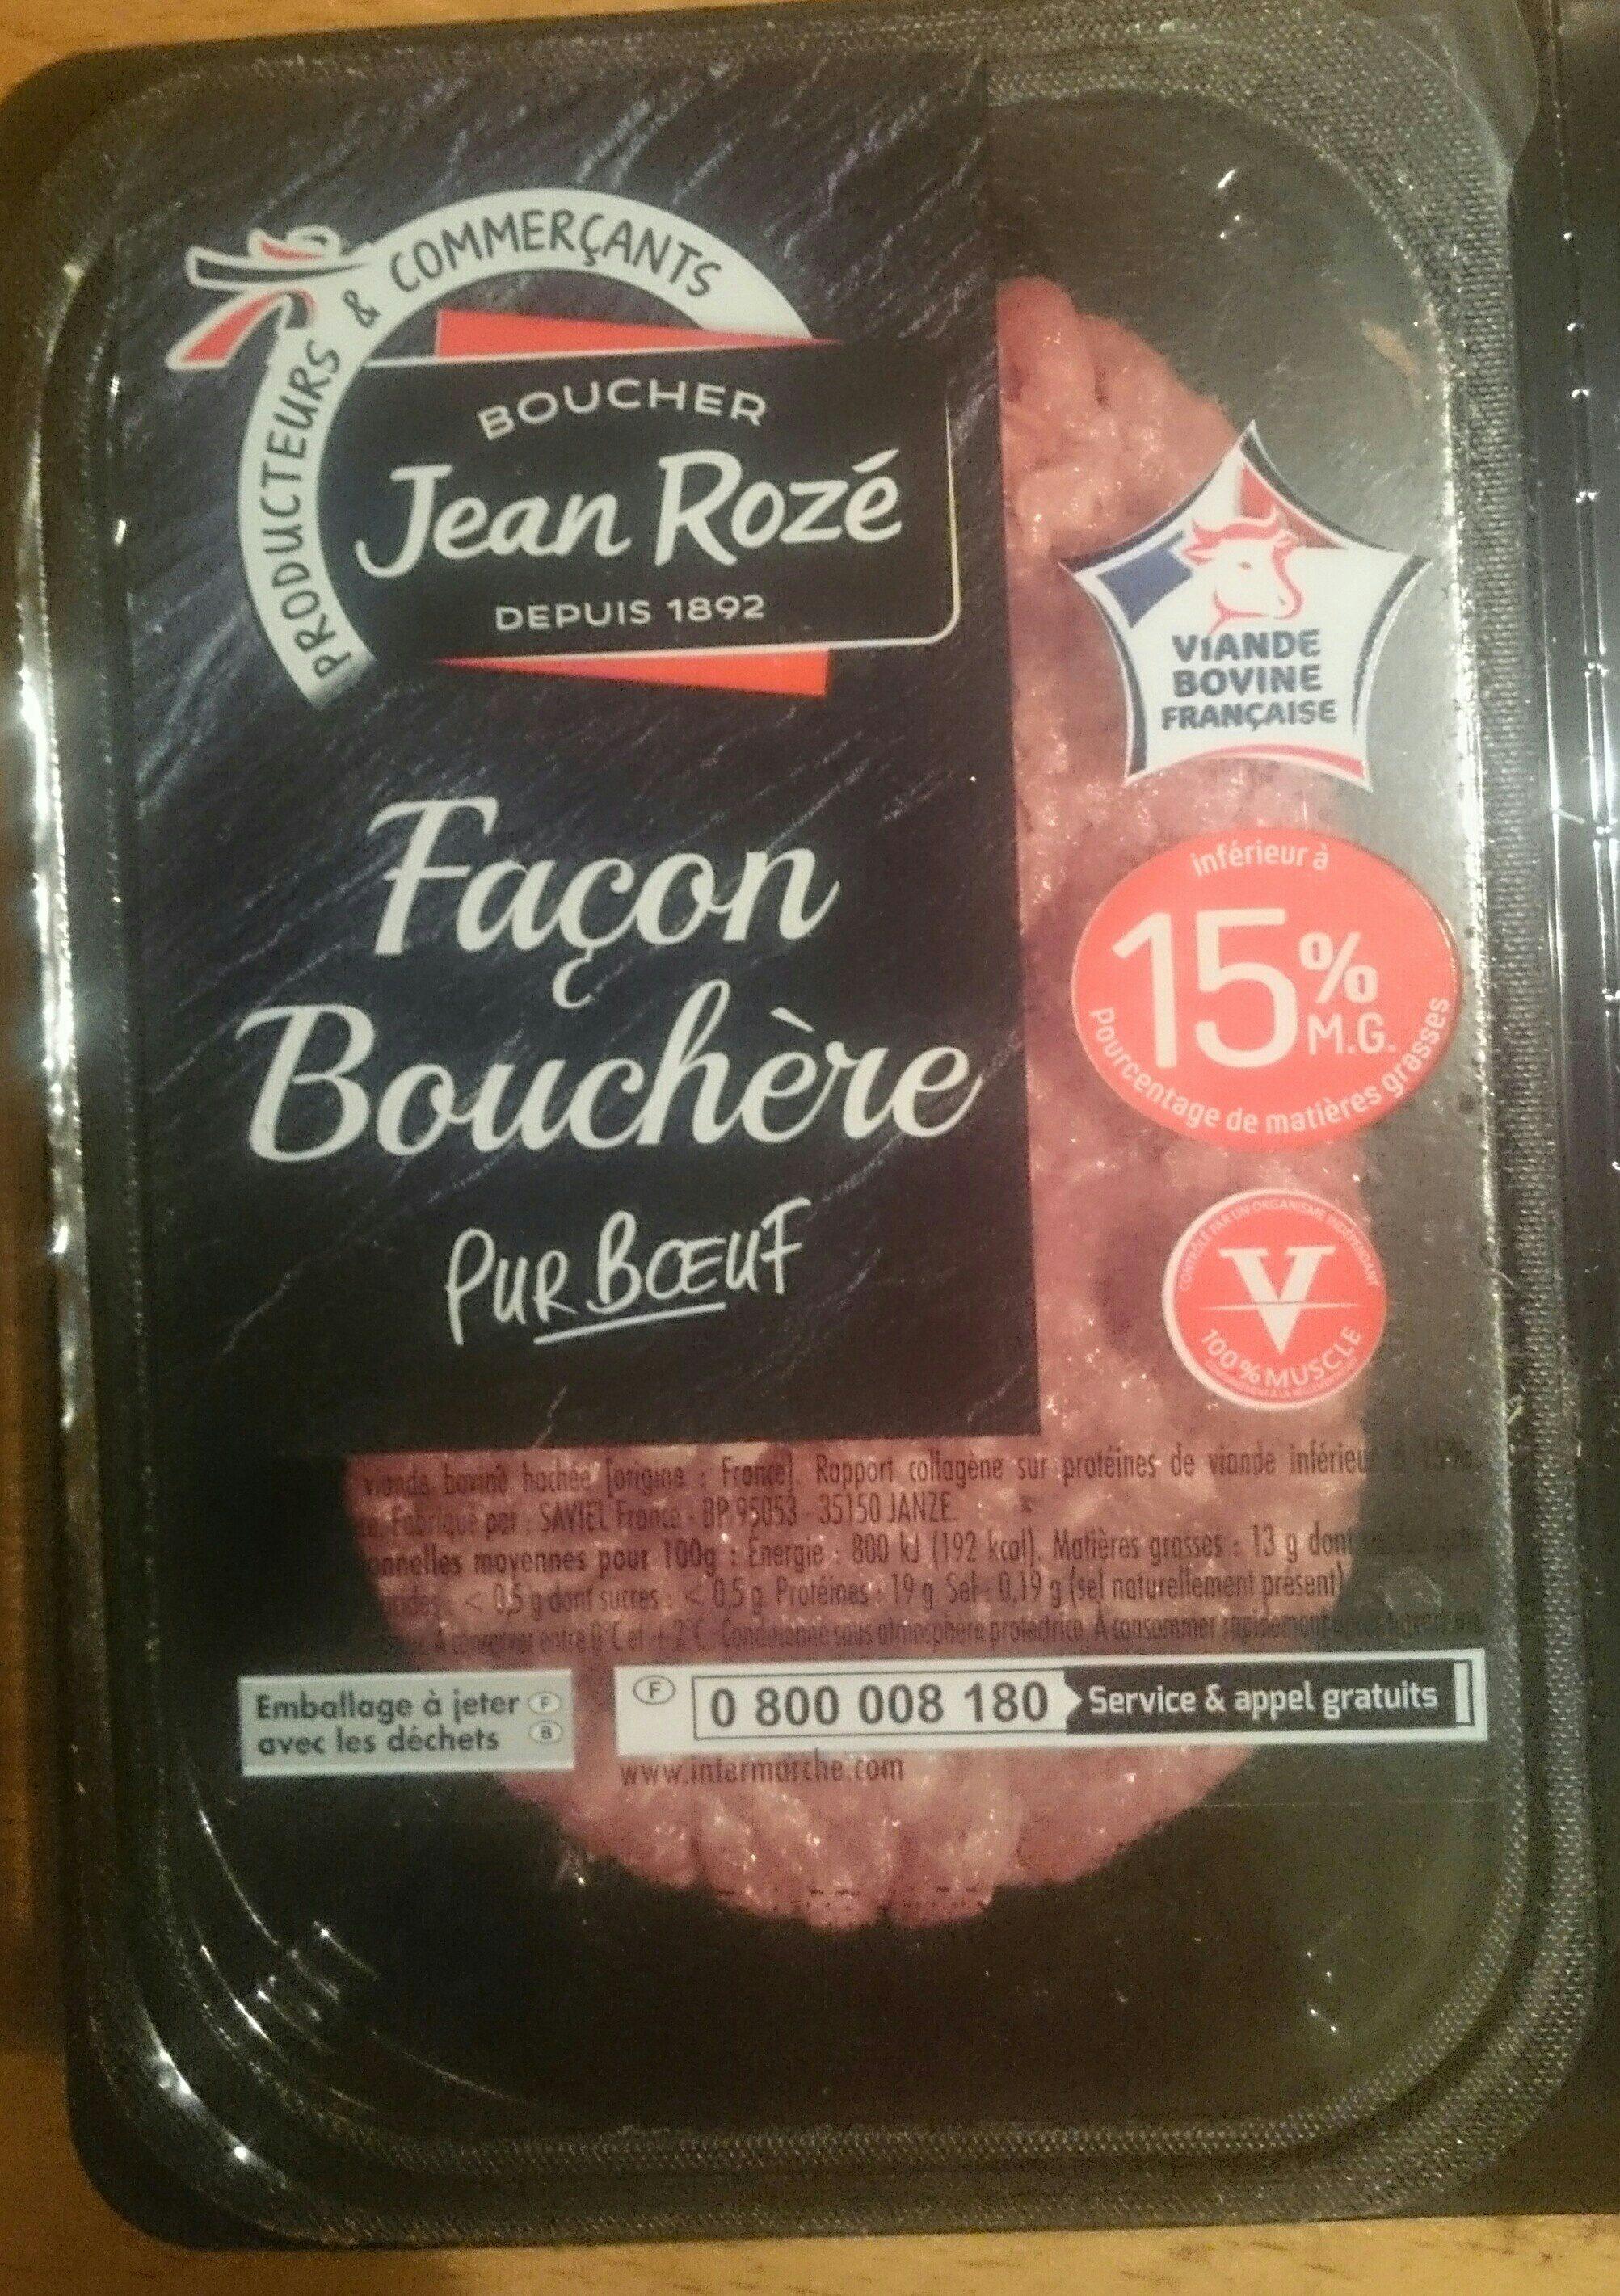 Steaks Hachés Façon Bouchère Pur Bœuf 15% MG - Ingrediënten - fr